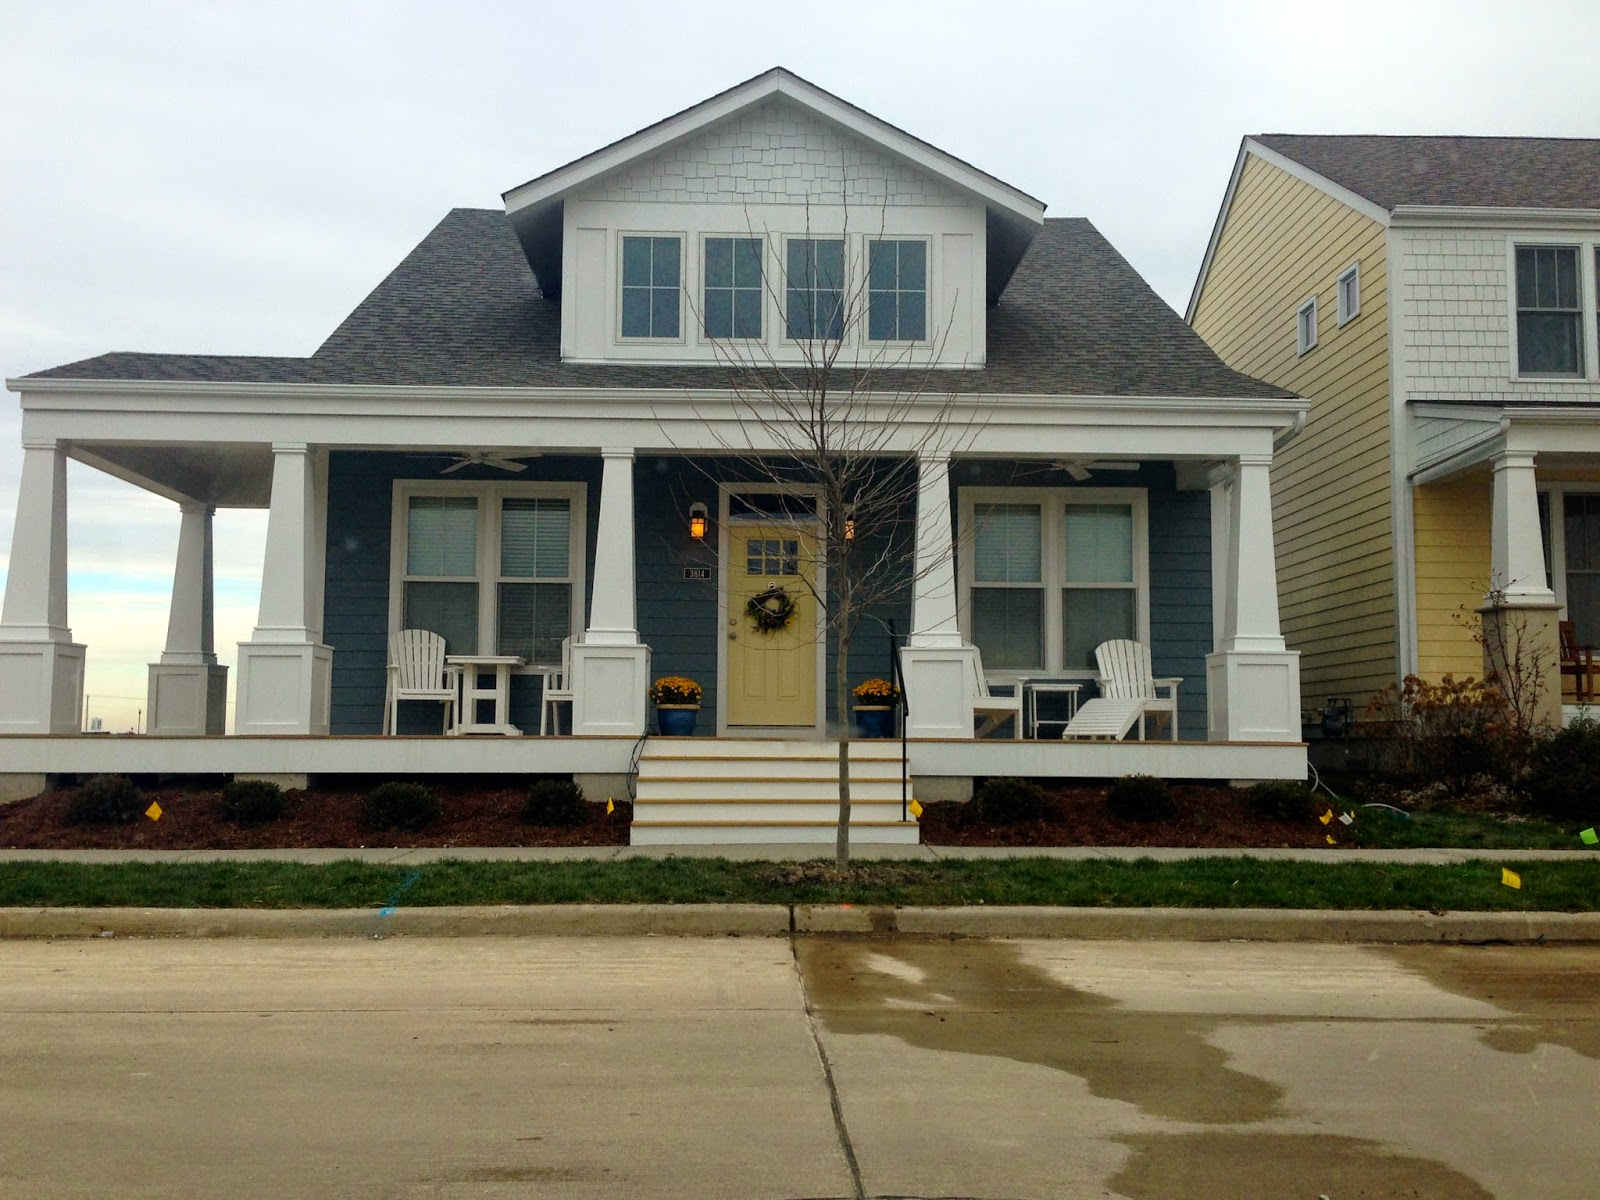 Our Good Life Help Us Name Our House - Beach house name ideas